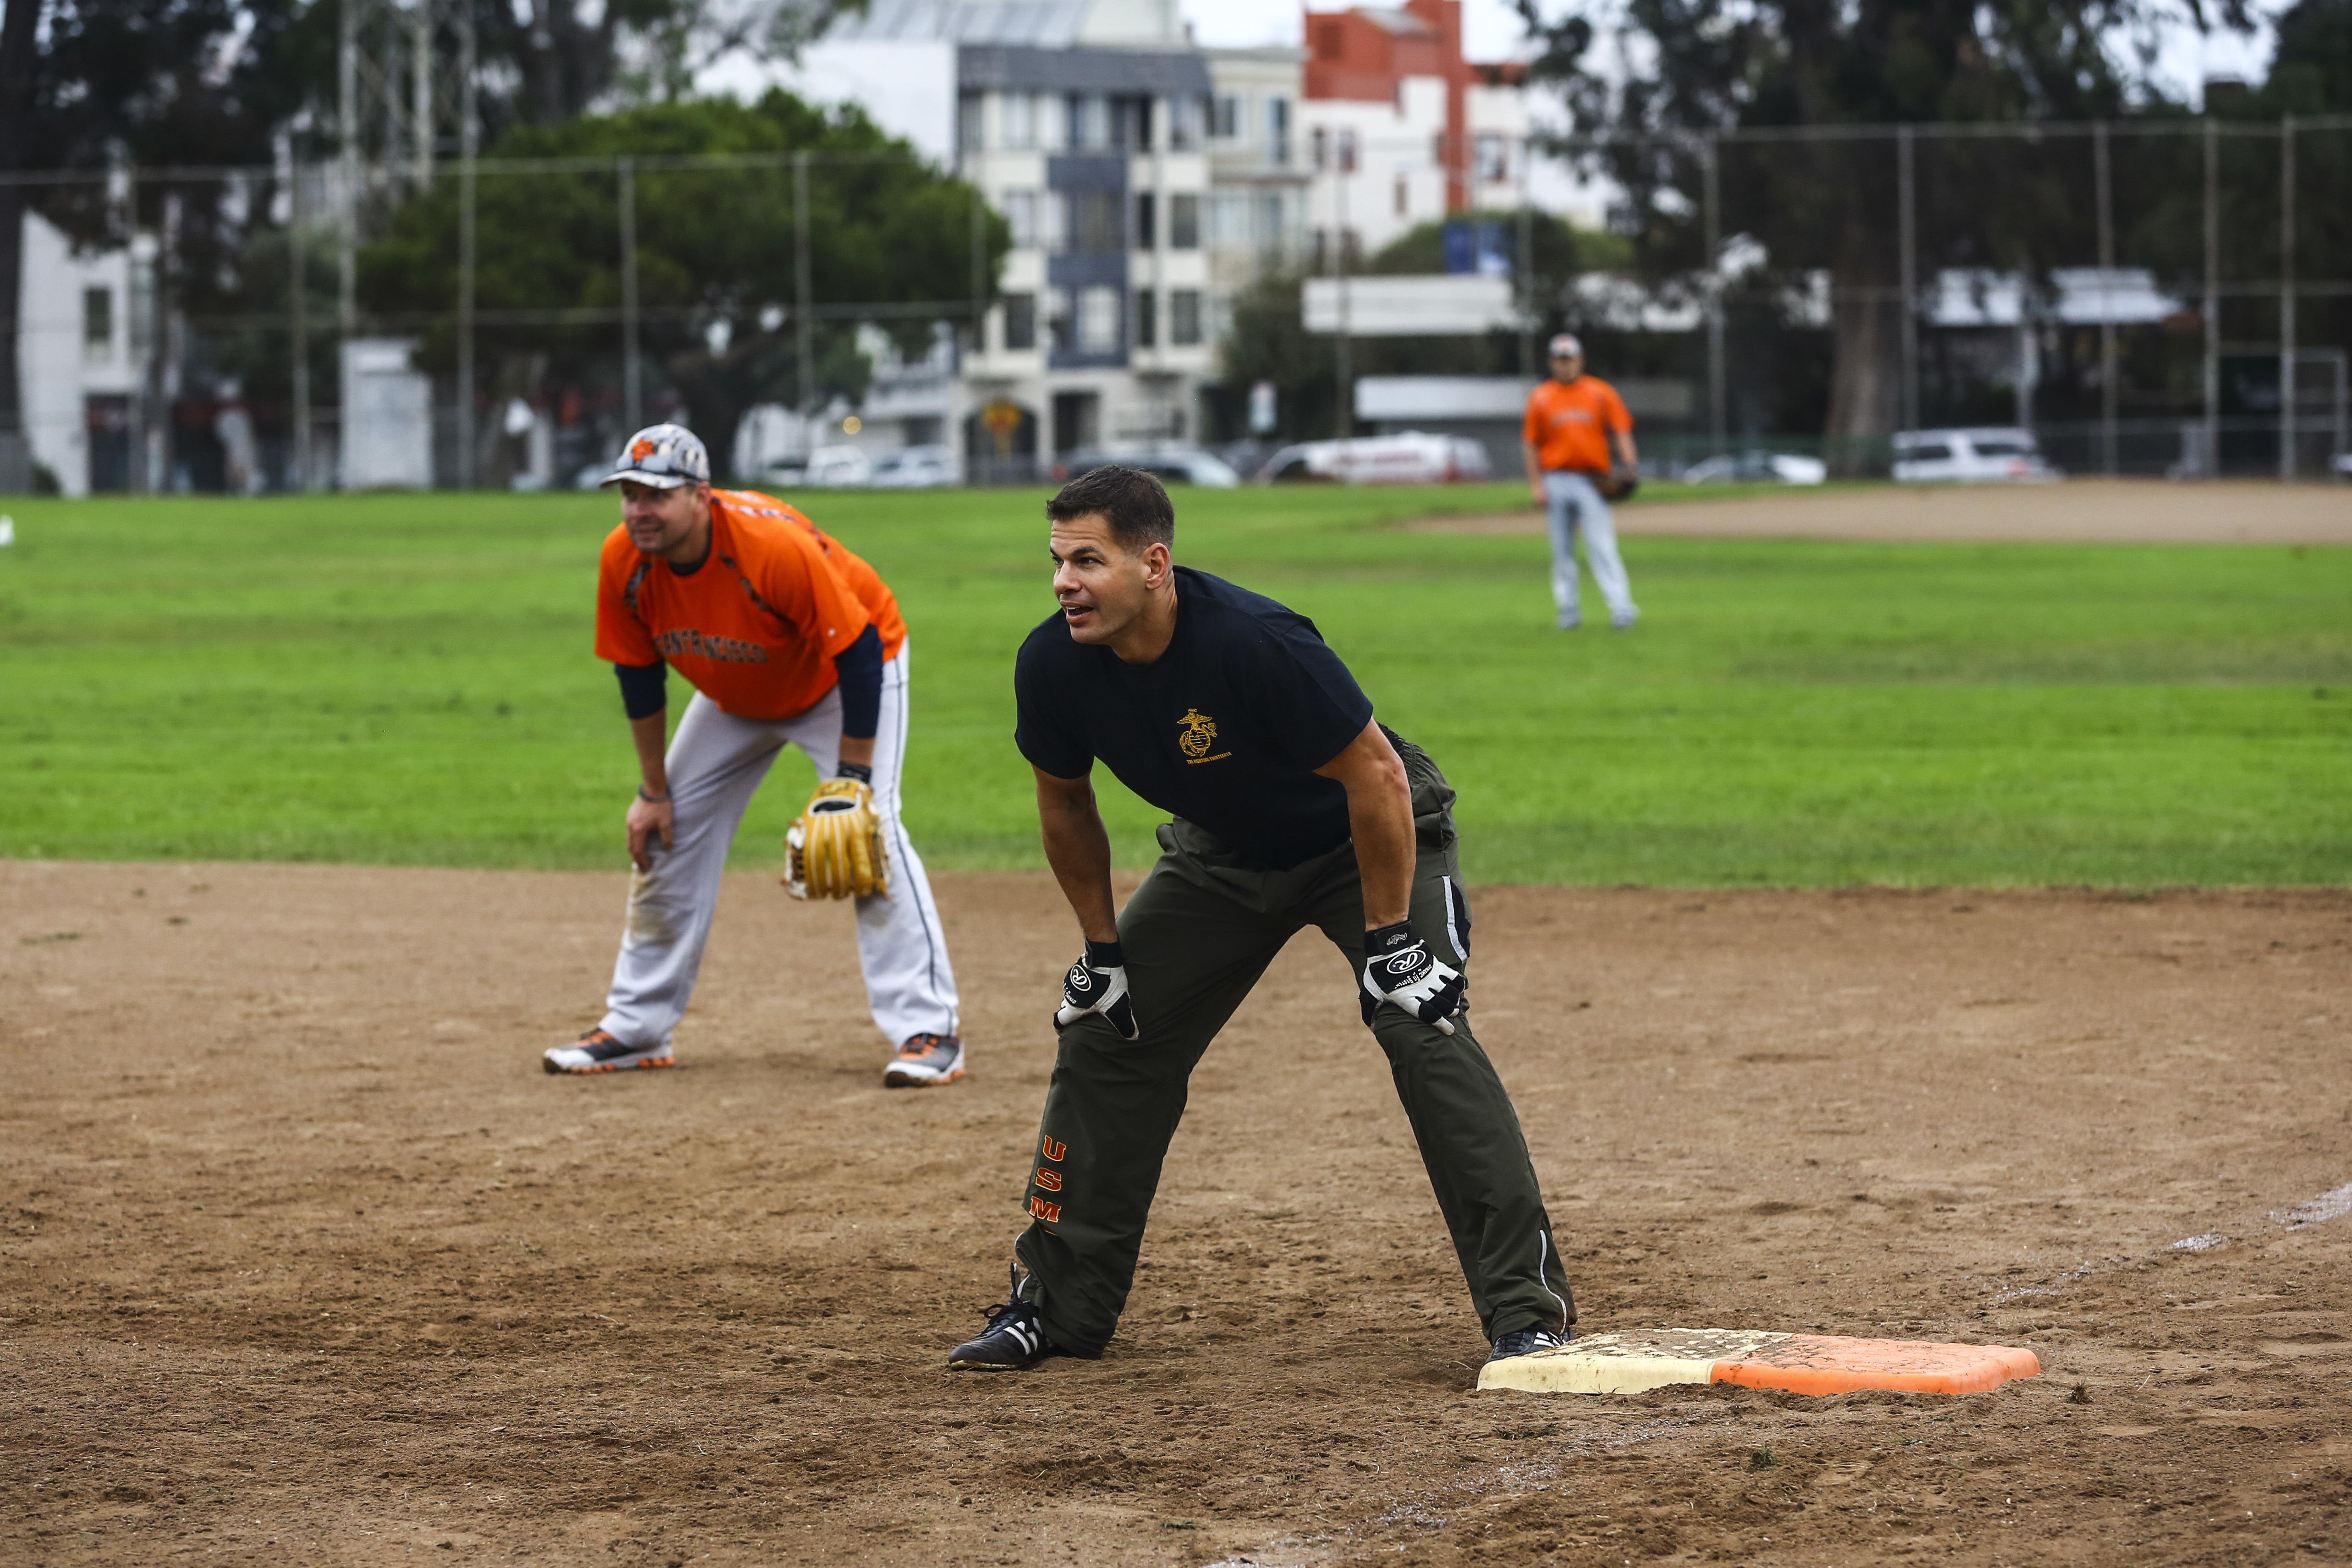 Marines_play_softball_against_San_Francisco_Police_Department_141010-M-TT095-047.jpg